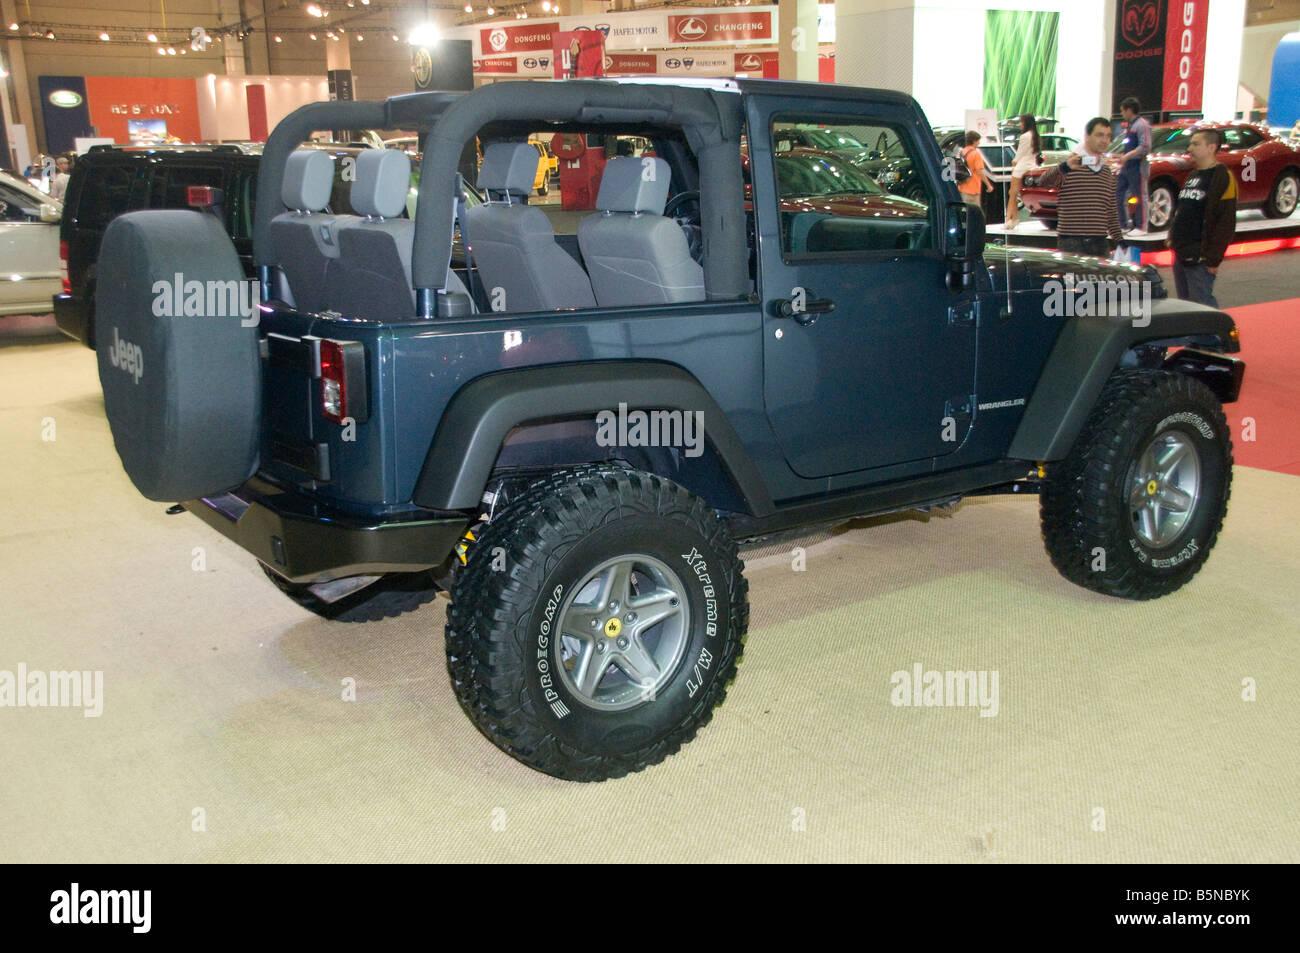 Jeep Wrangler Rubicon 2 Door 4x4 Off Road Car Stock Photo 20754039